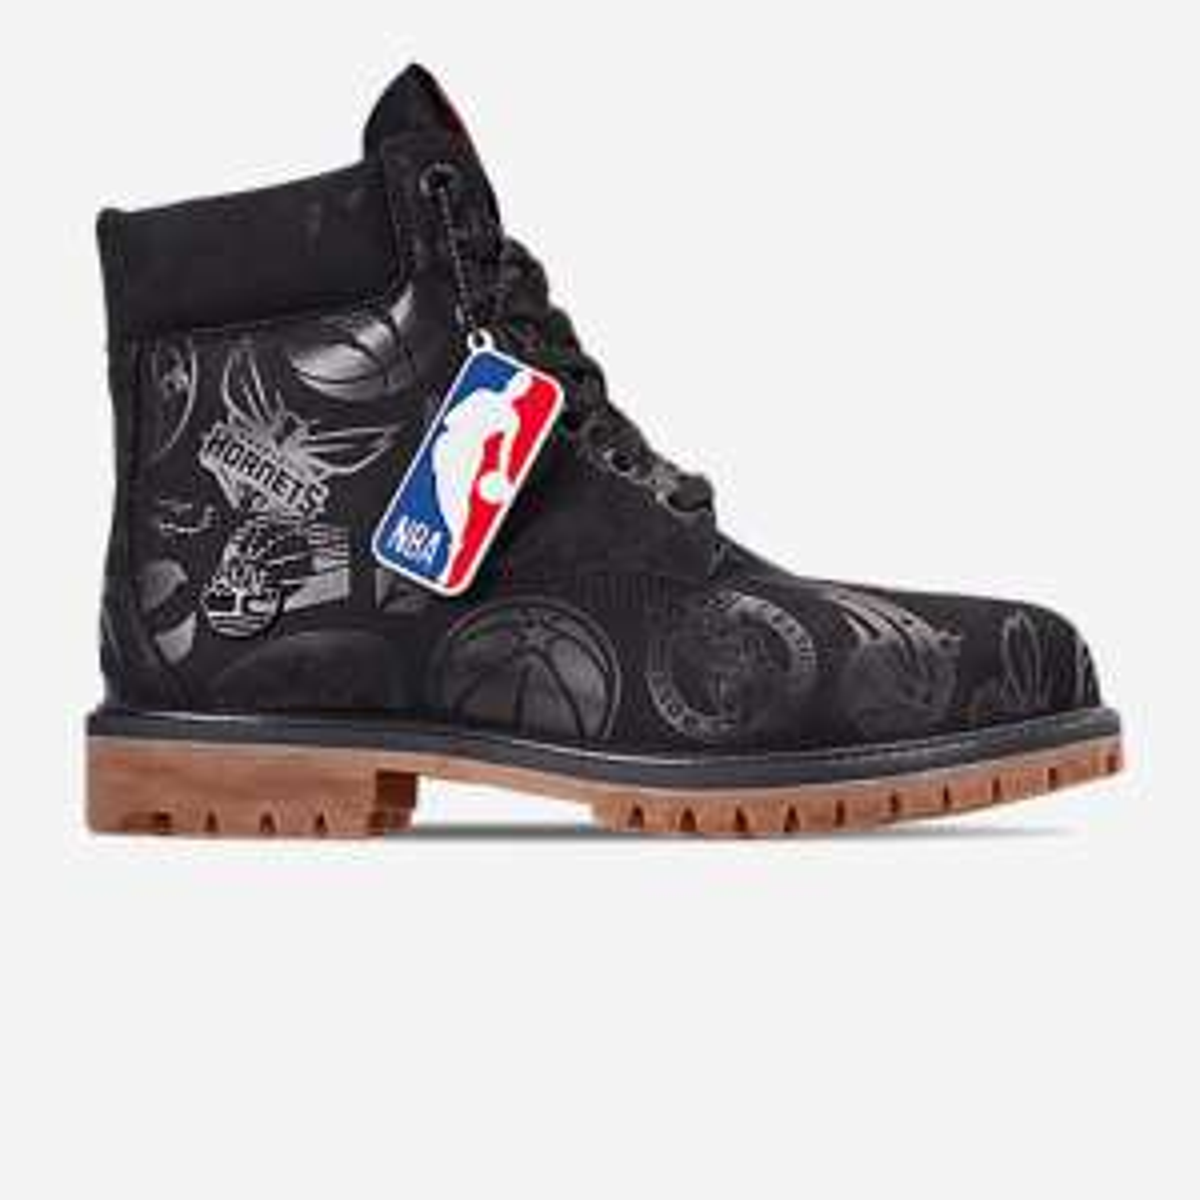 Paire de Chaussures Timberland 6-Inch Premium Boot - NBA East vs West (shinzo.paris)